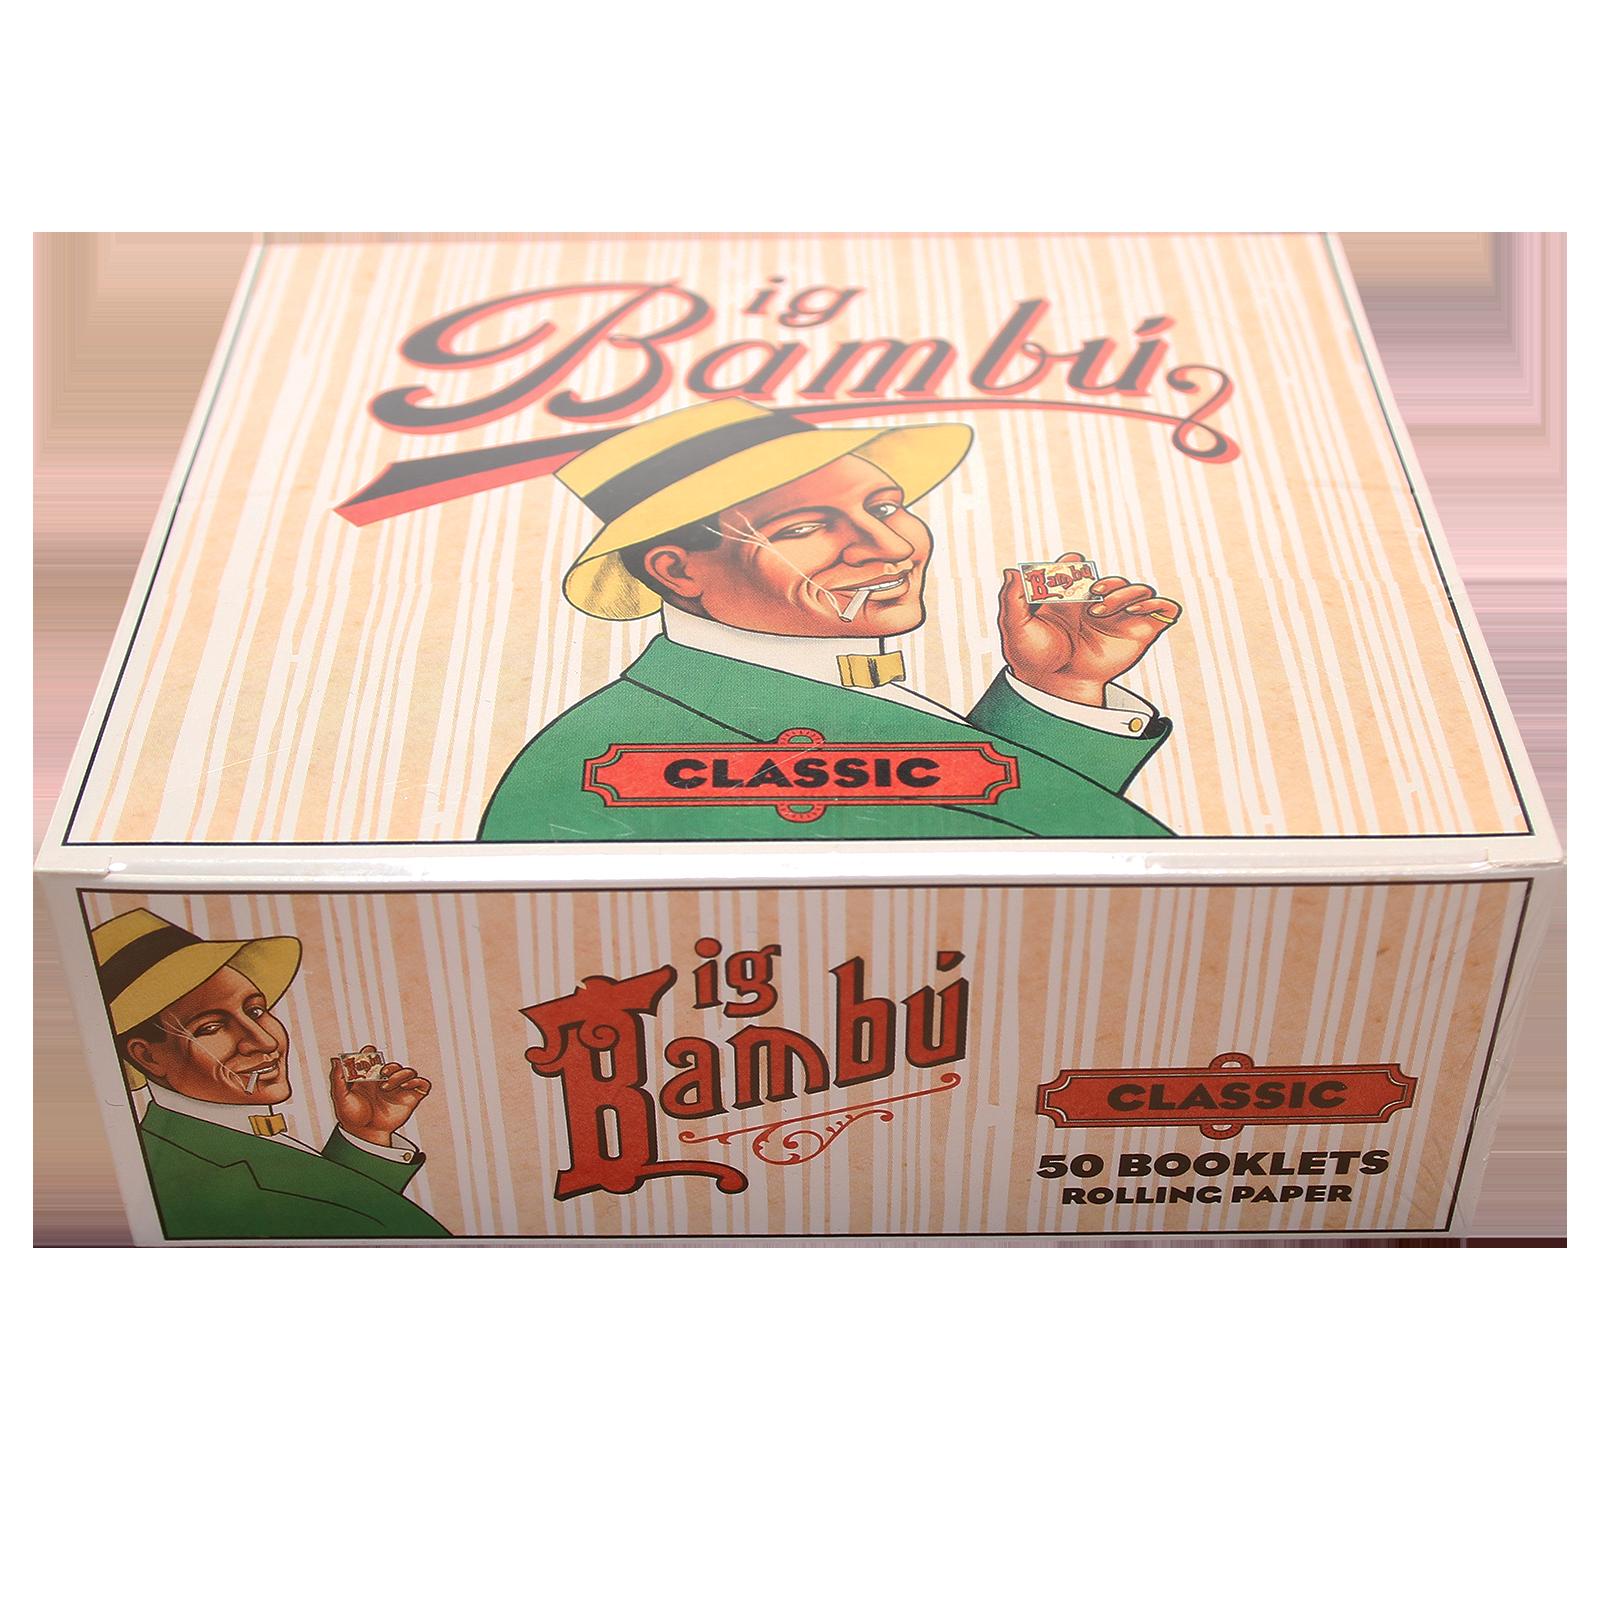 Big bamb classic pack. Cigar clipart burning